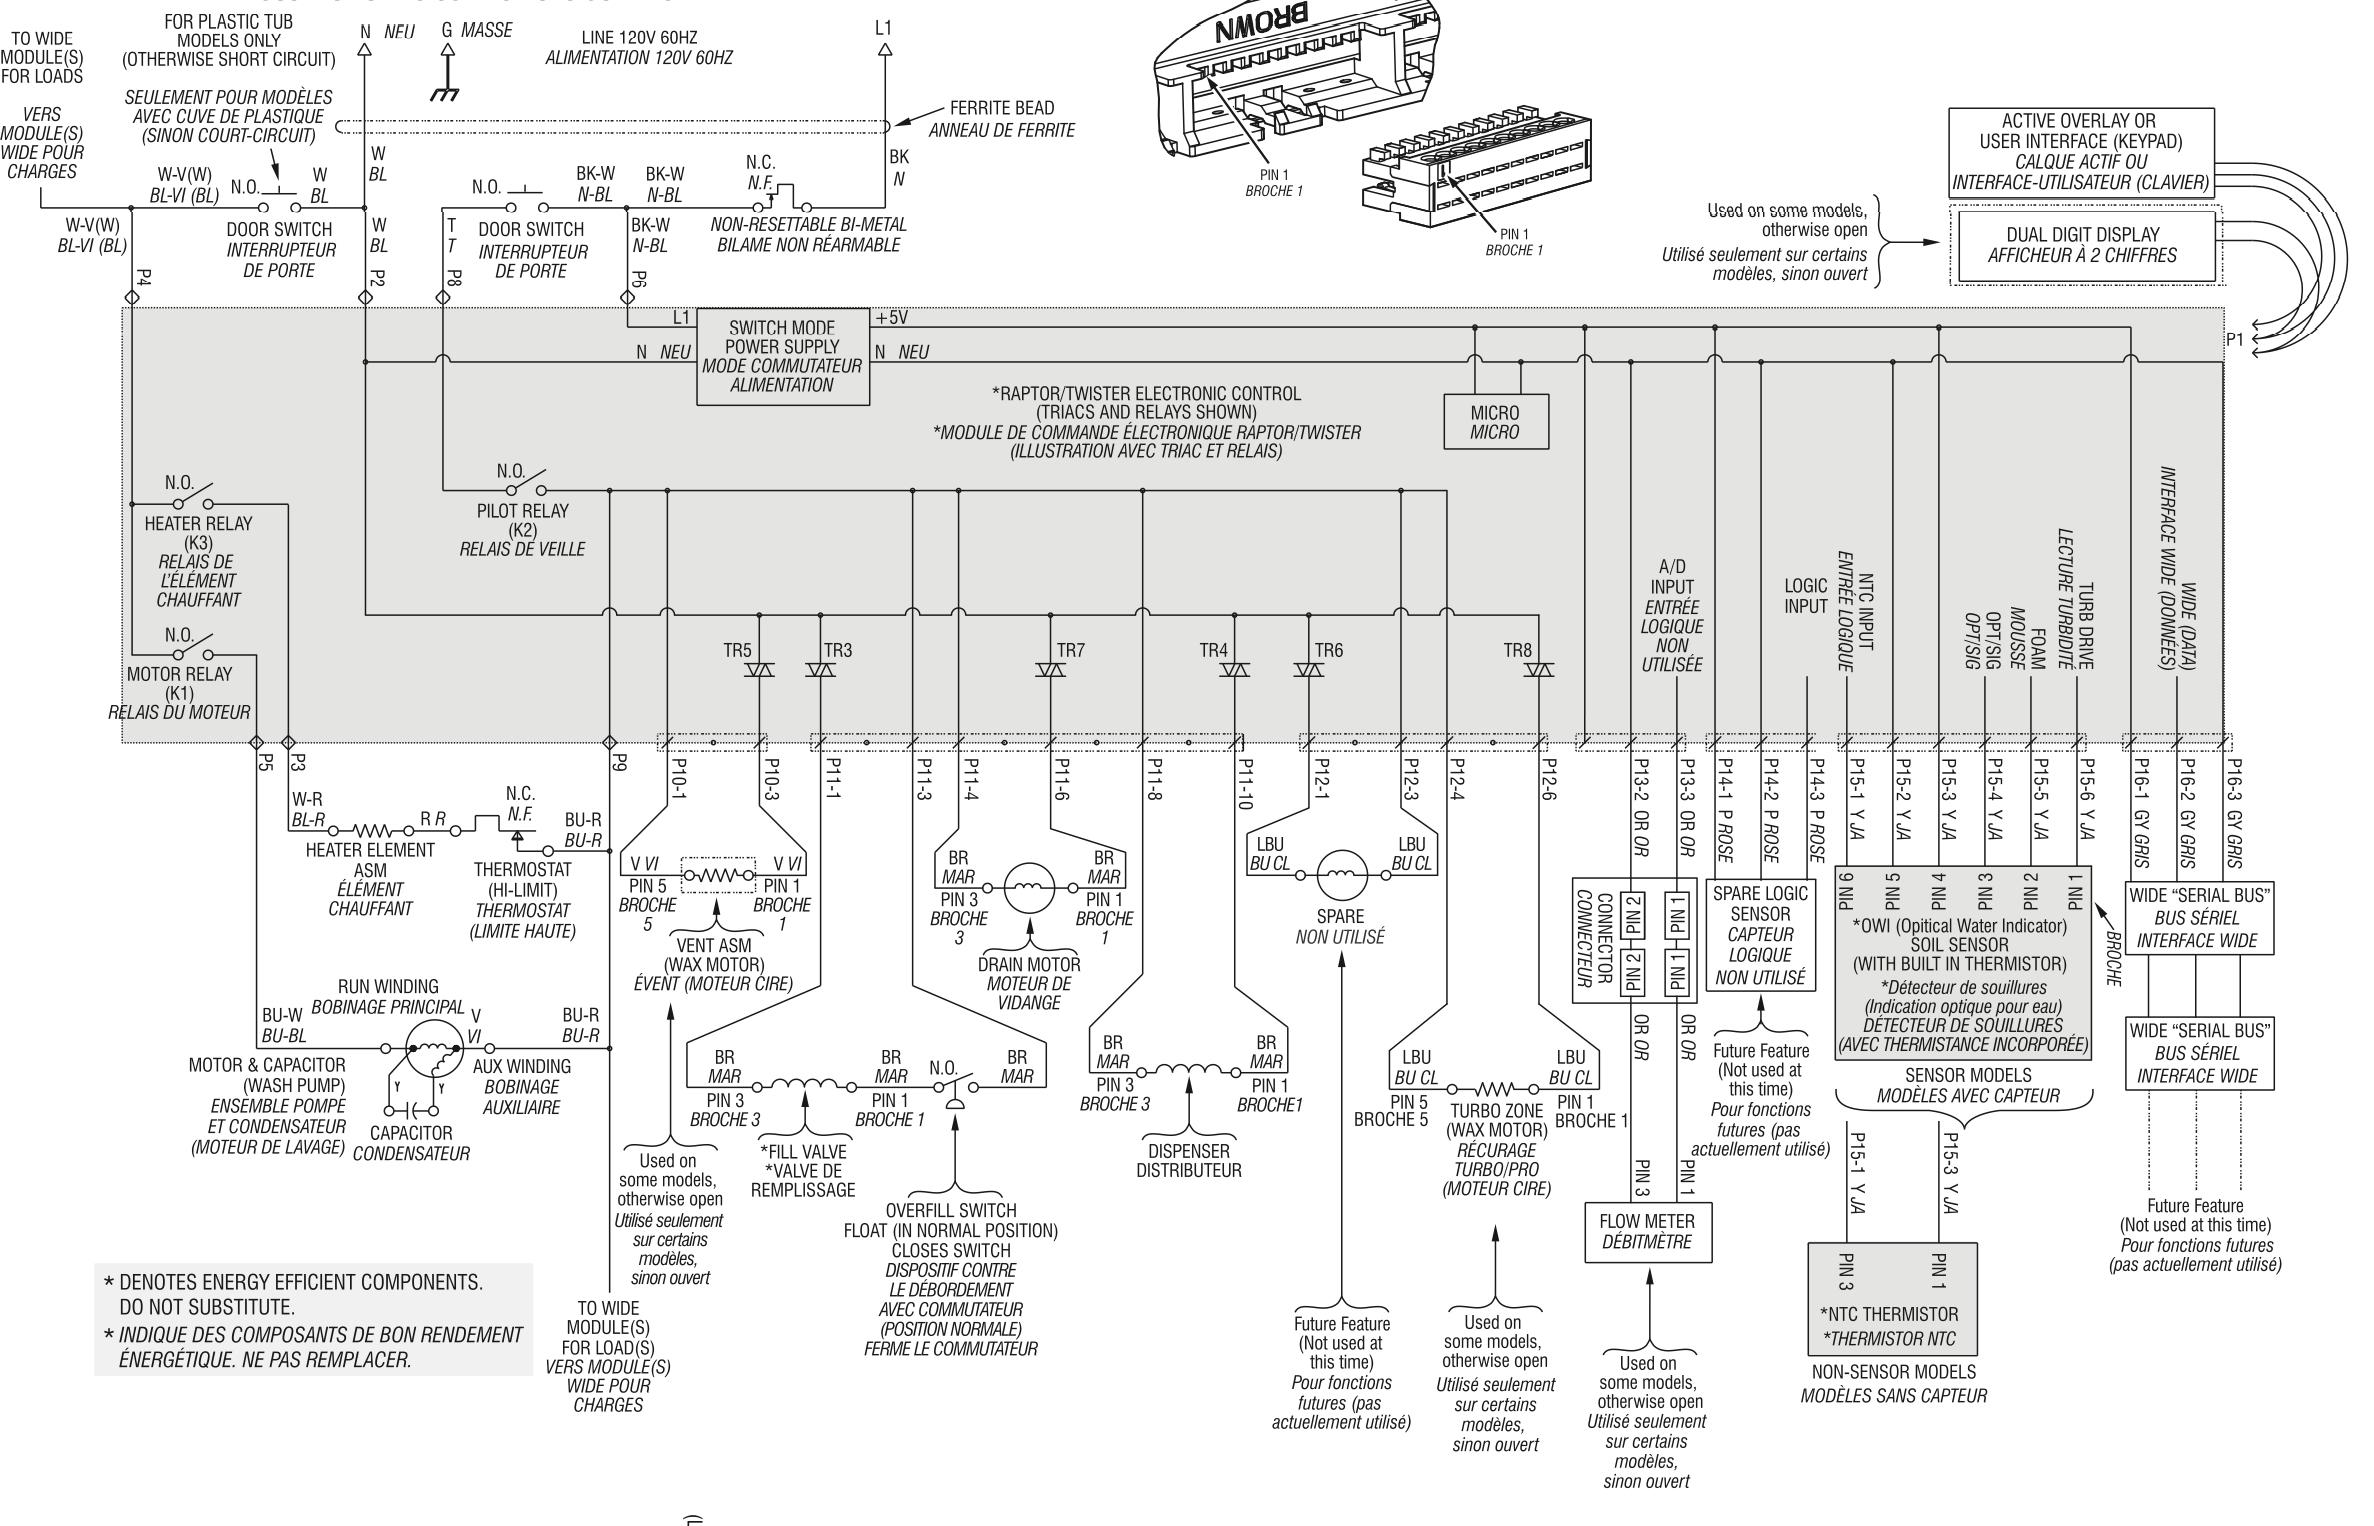 I Need A Wiring Diagram For A Mod Mdbh979Awb2 Dishwasher. It Is A - Ac Unit Wiring Diagram